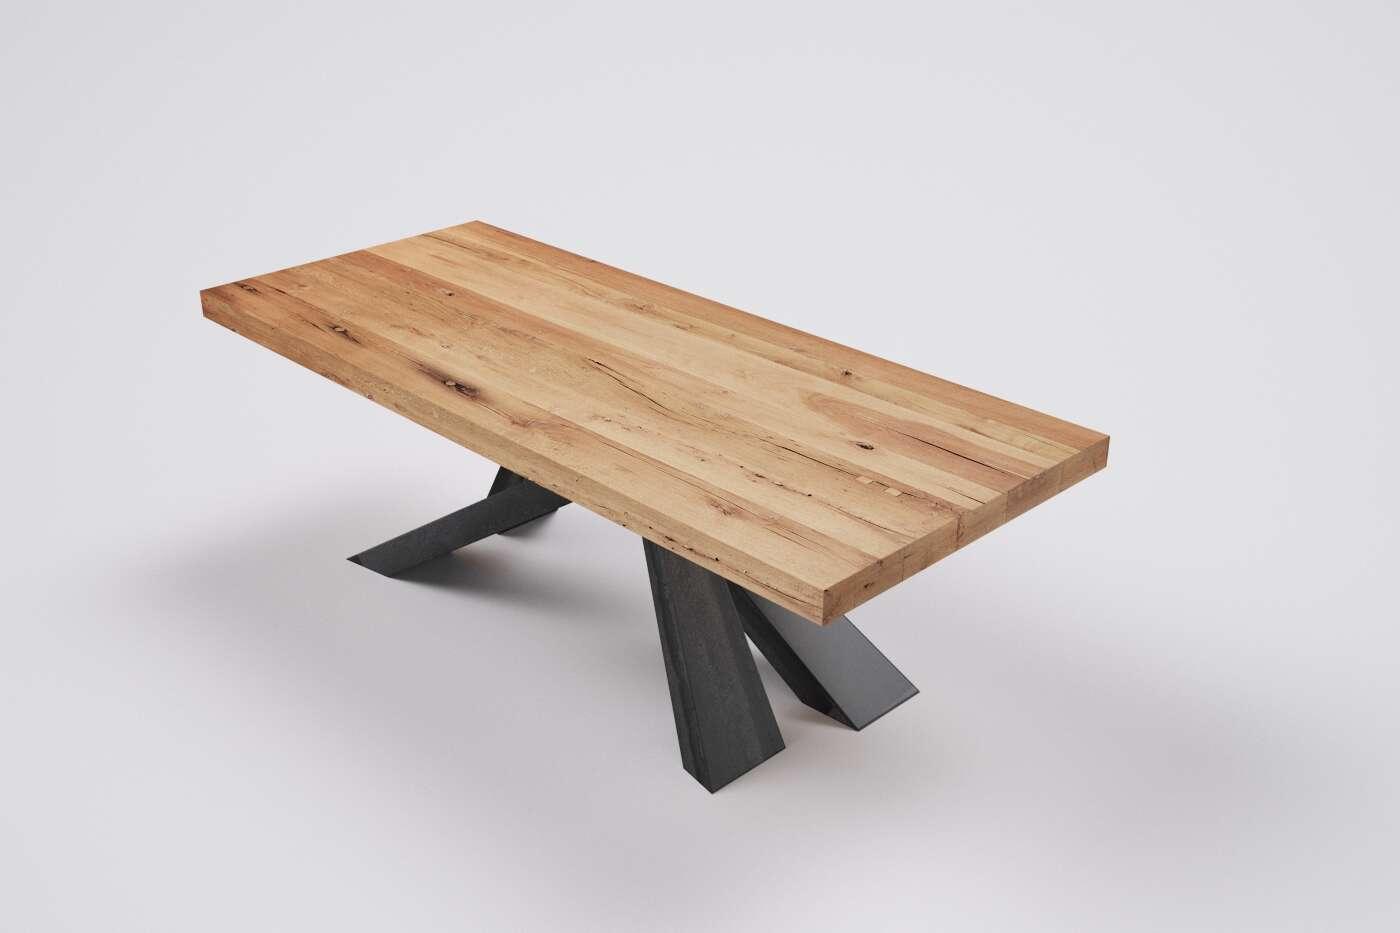 Gartentisch Holz Mit Metallgestell Alter Shabby Kinderstuhl Holz